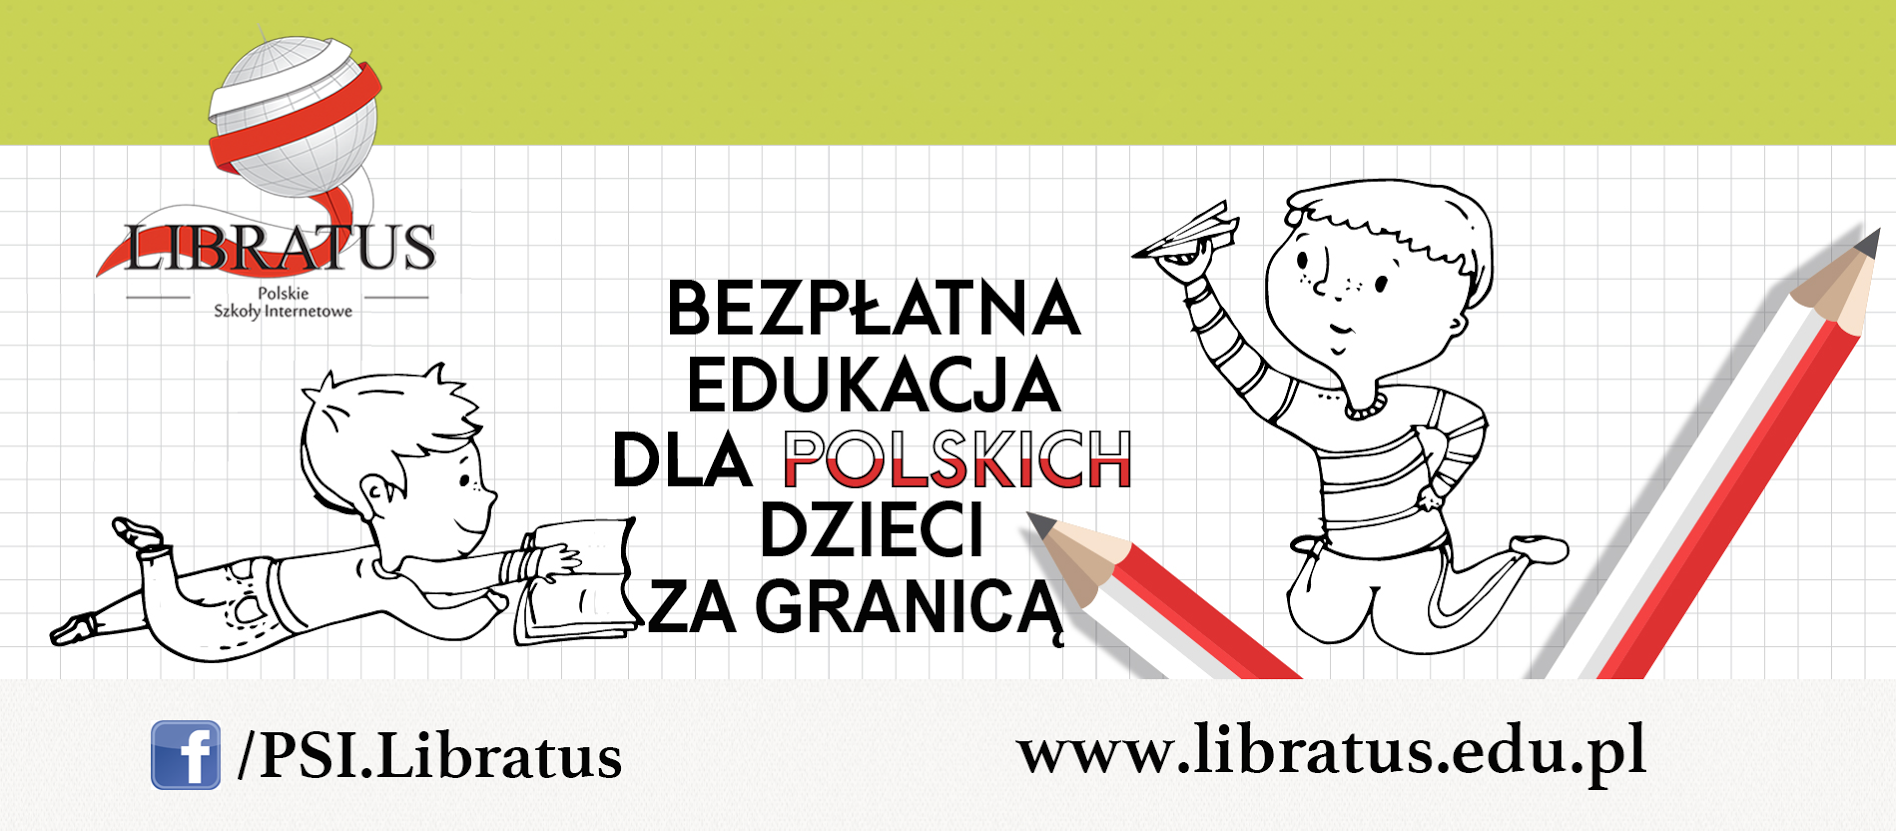 http://www.libratus.edu.pl/